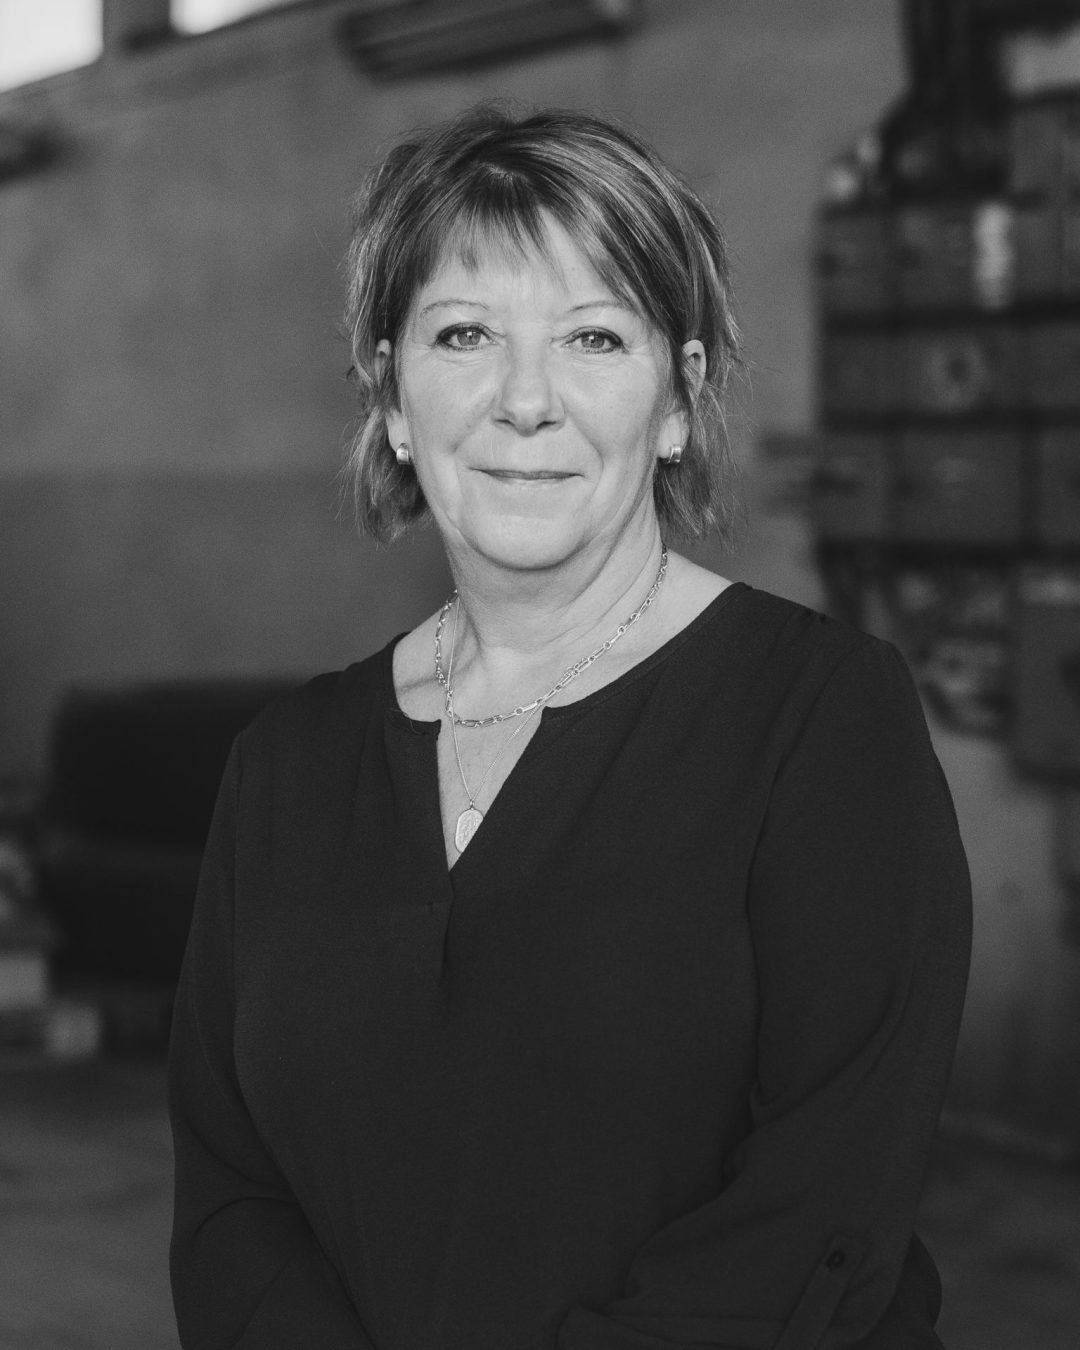 Elisabeth Olsson